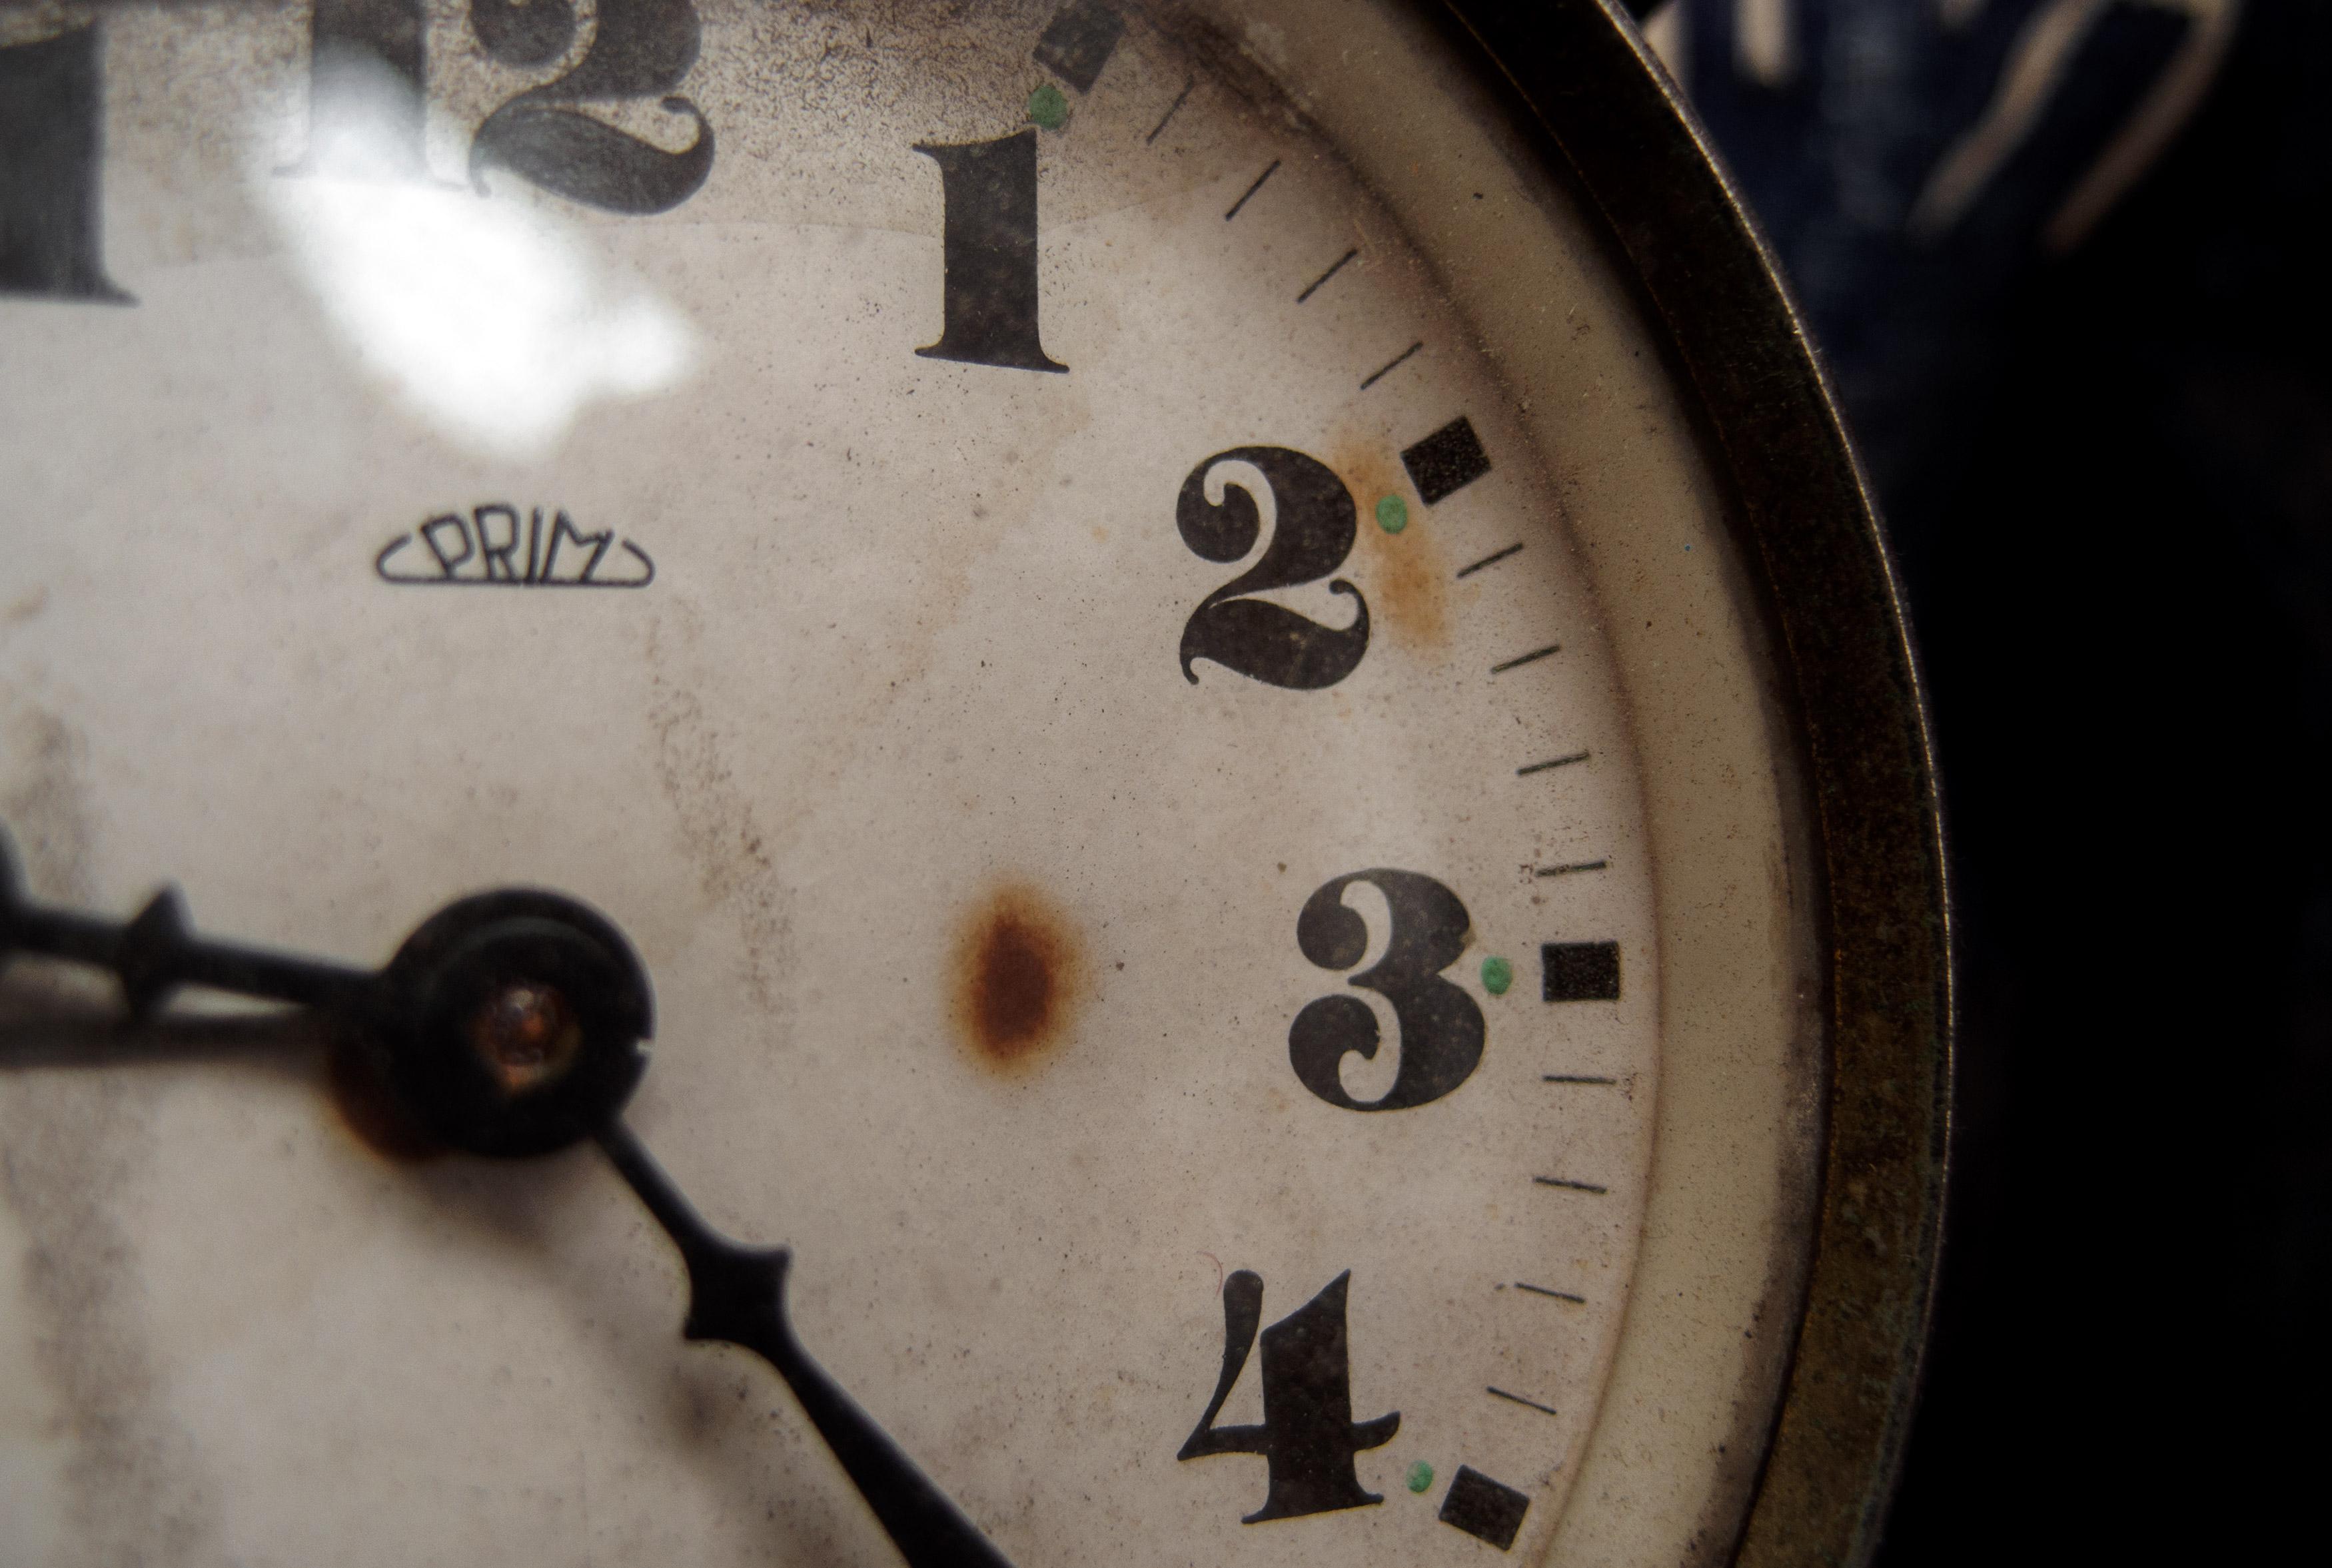 FREE IMAGE: Vintage alarm clock - Libreshot Public Domain ...